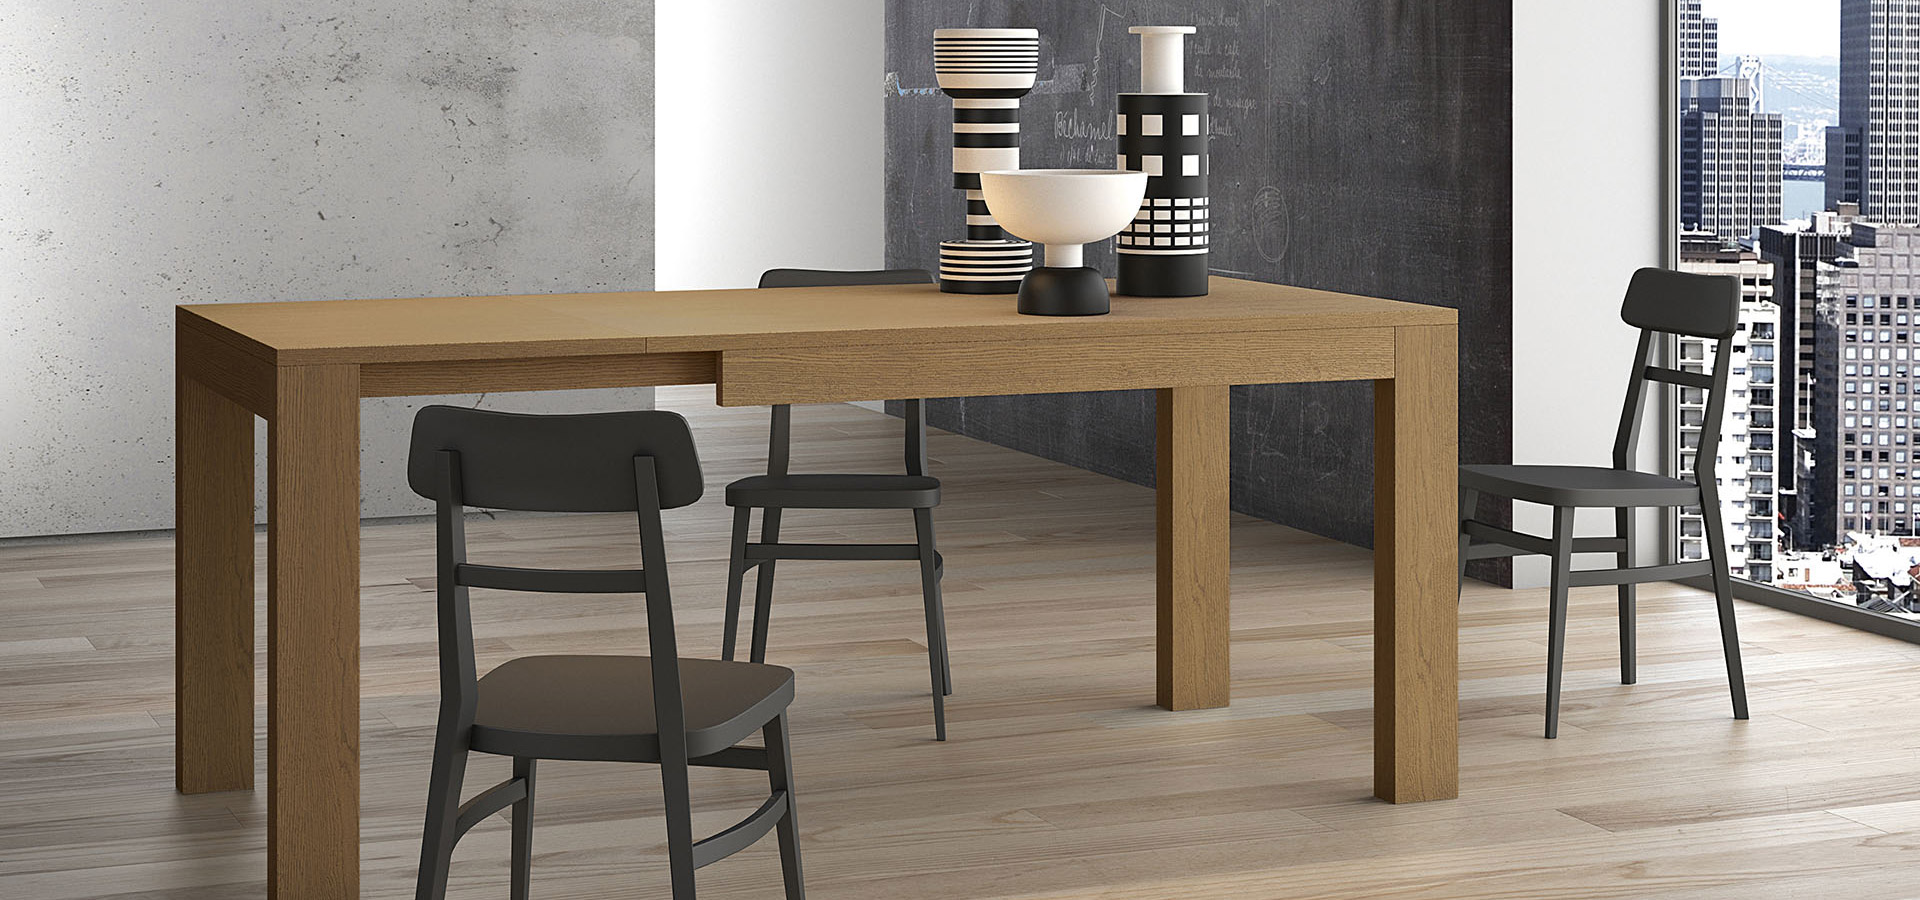 Beautiful tavoli cucina allungabili moderni images ideas for Tavoli moderni design